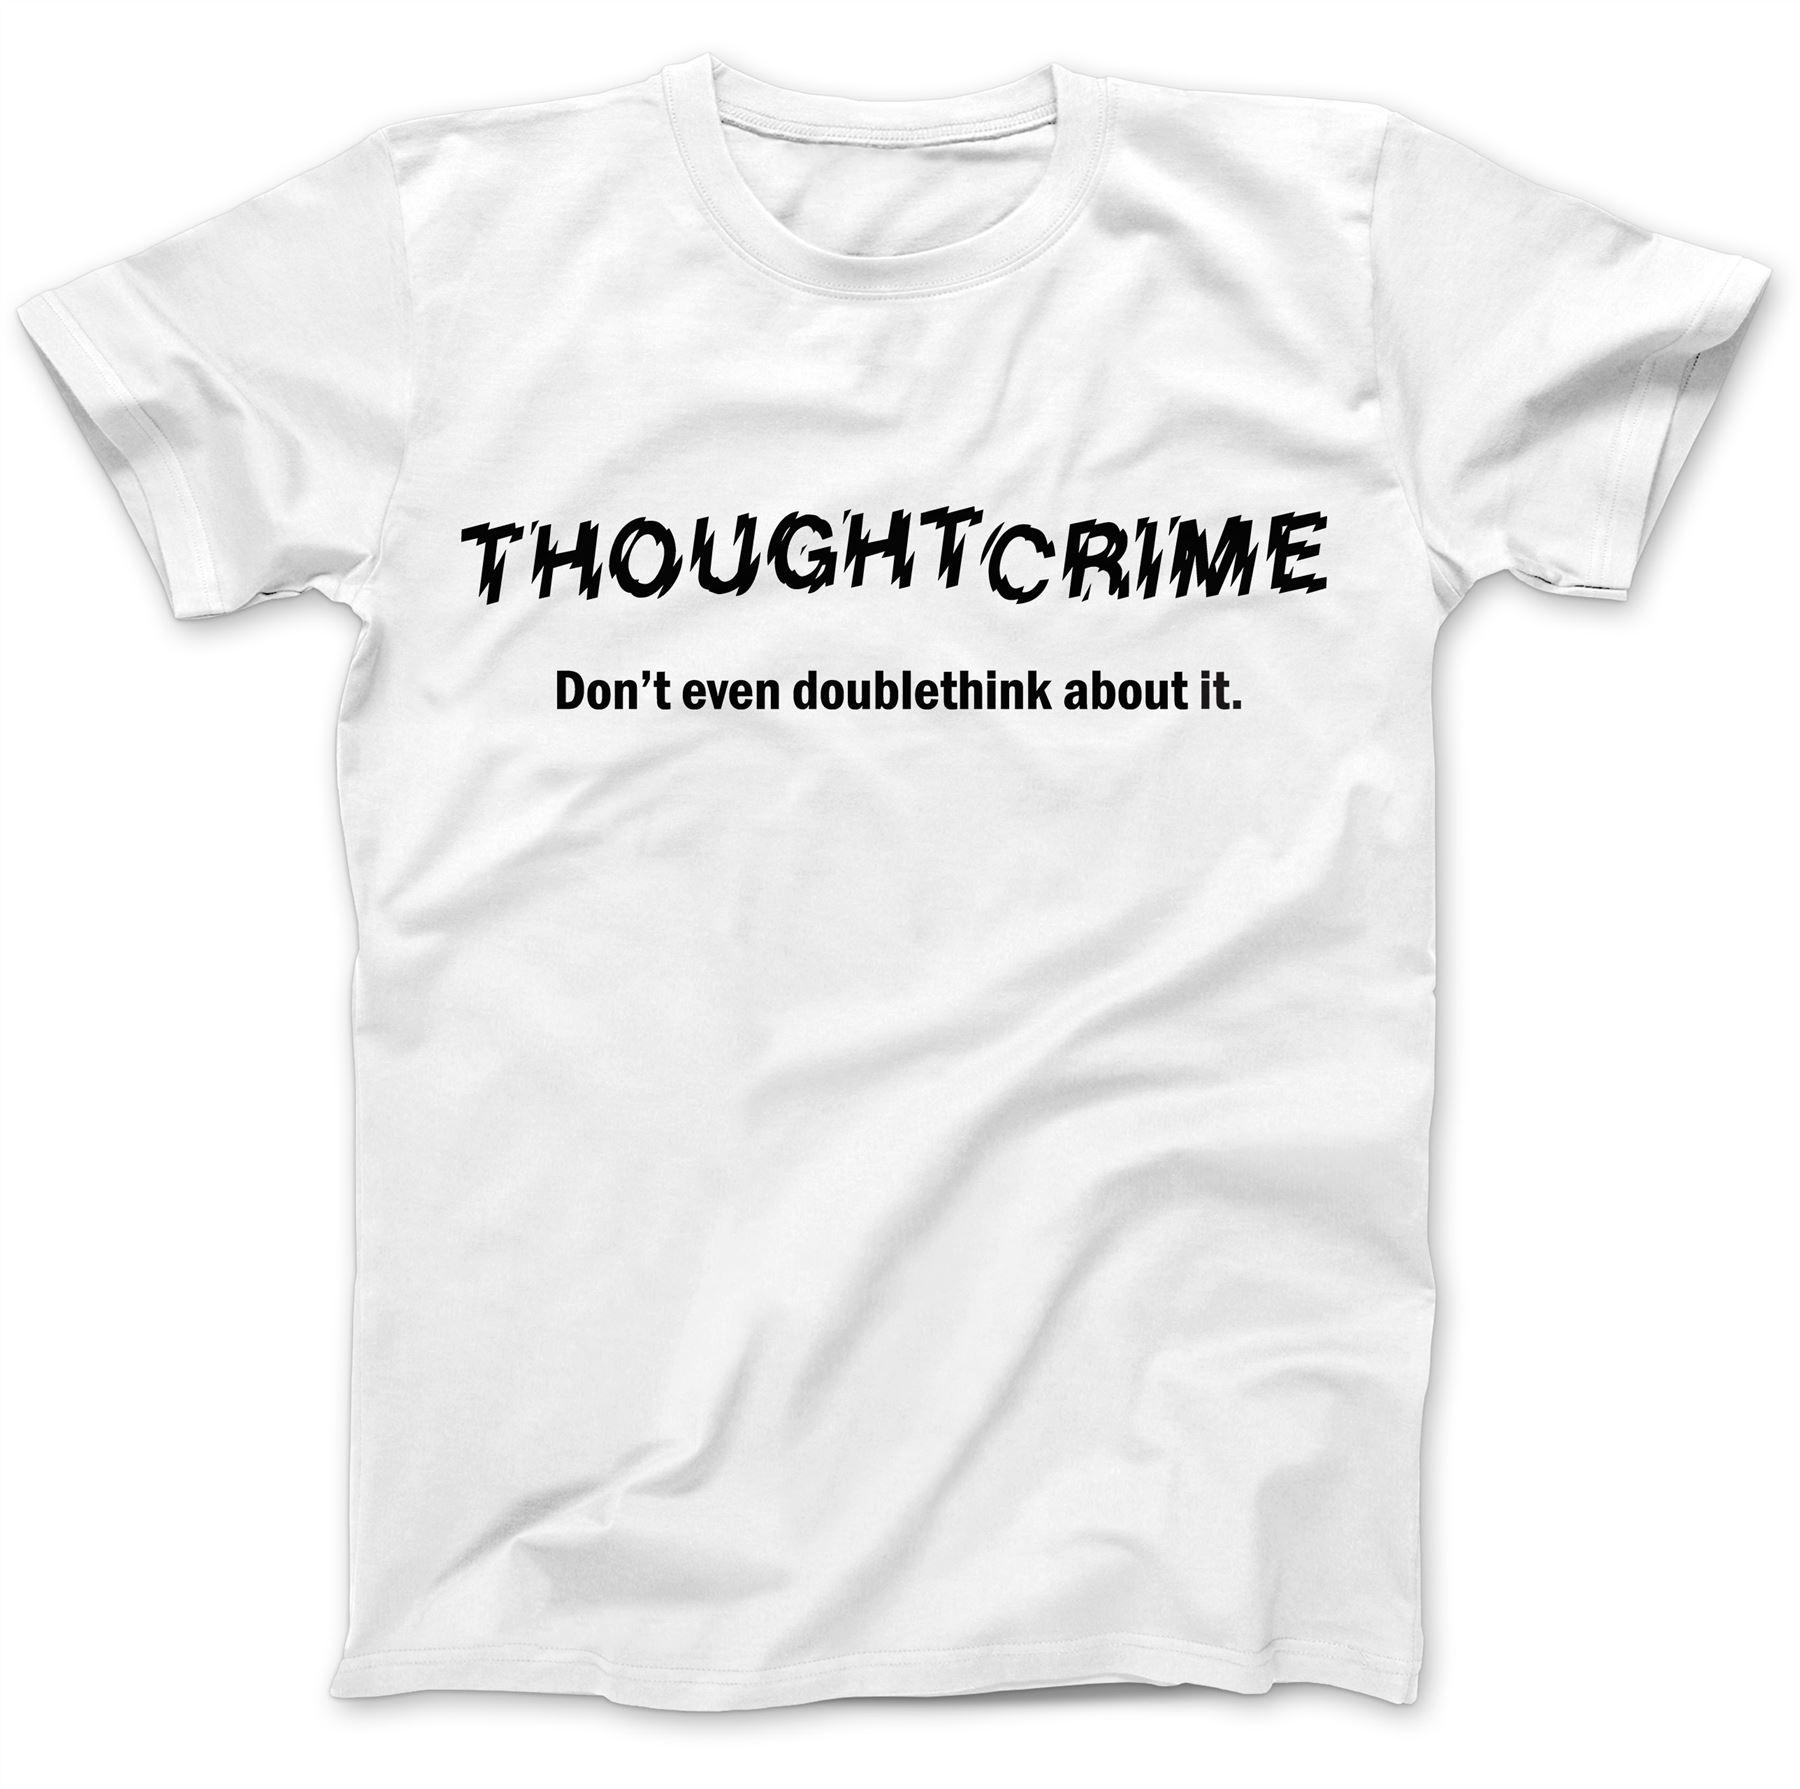 1984-Thought-Crime-George-Orwell-T-Shirt-100-Premium-Cotton-Animal-Farm miniatuur 24